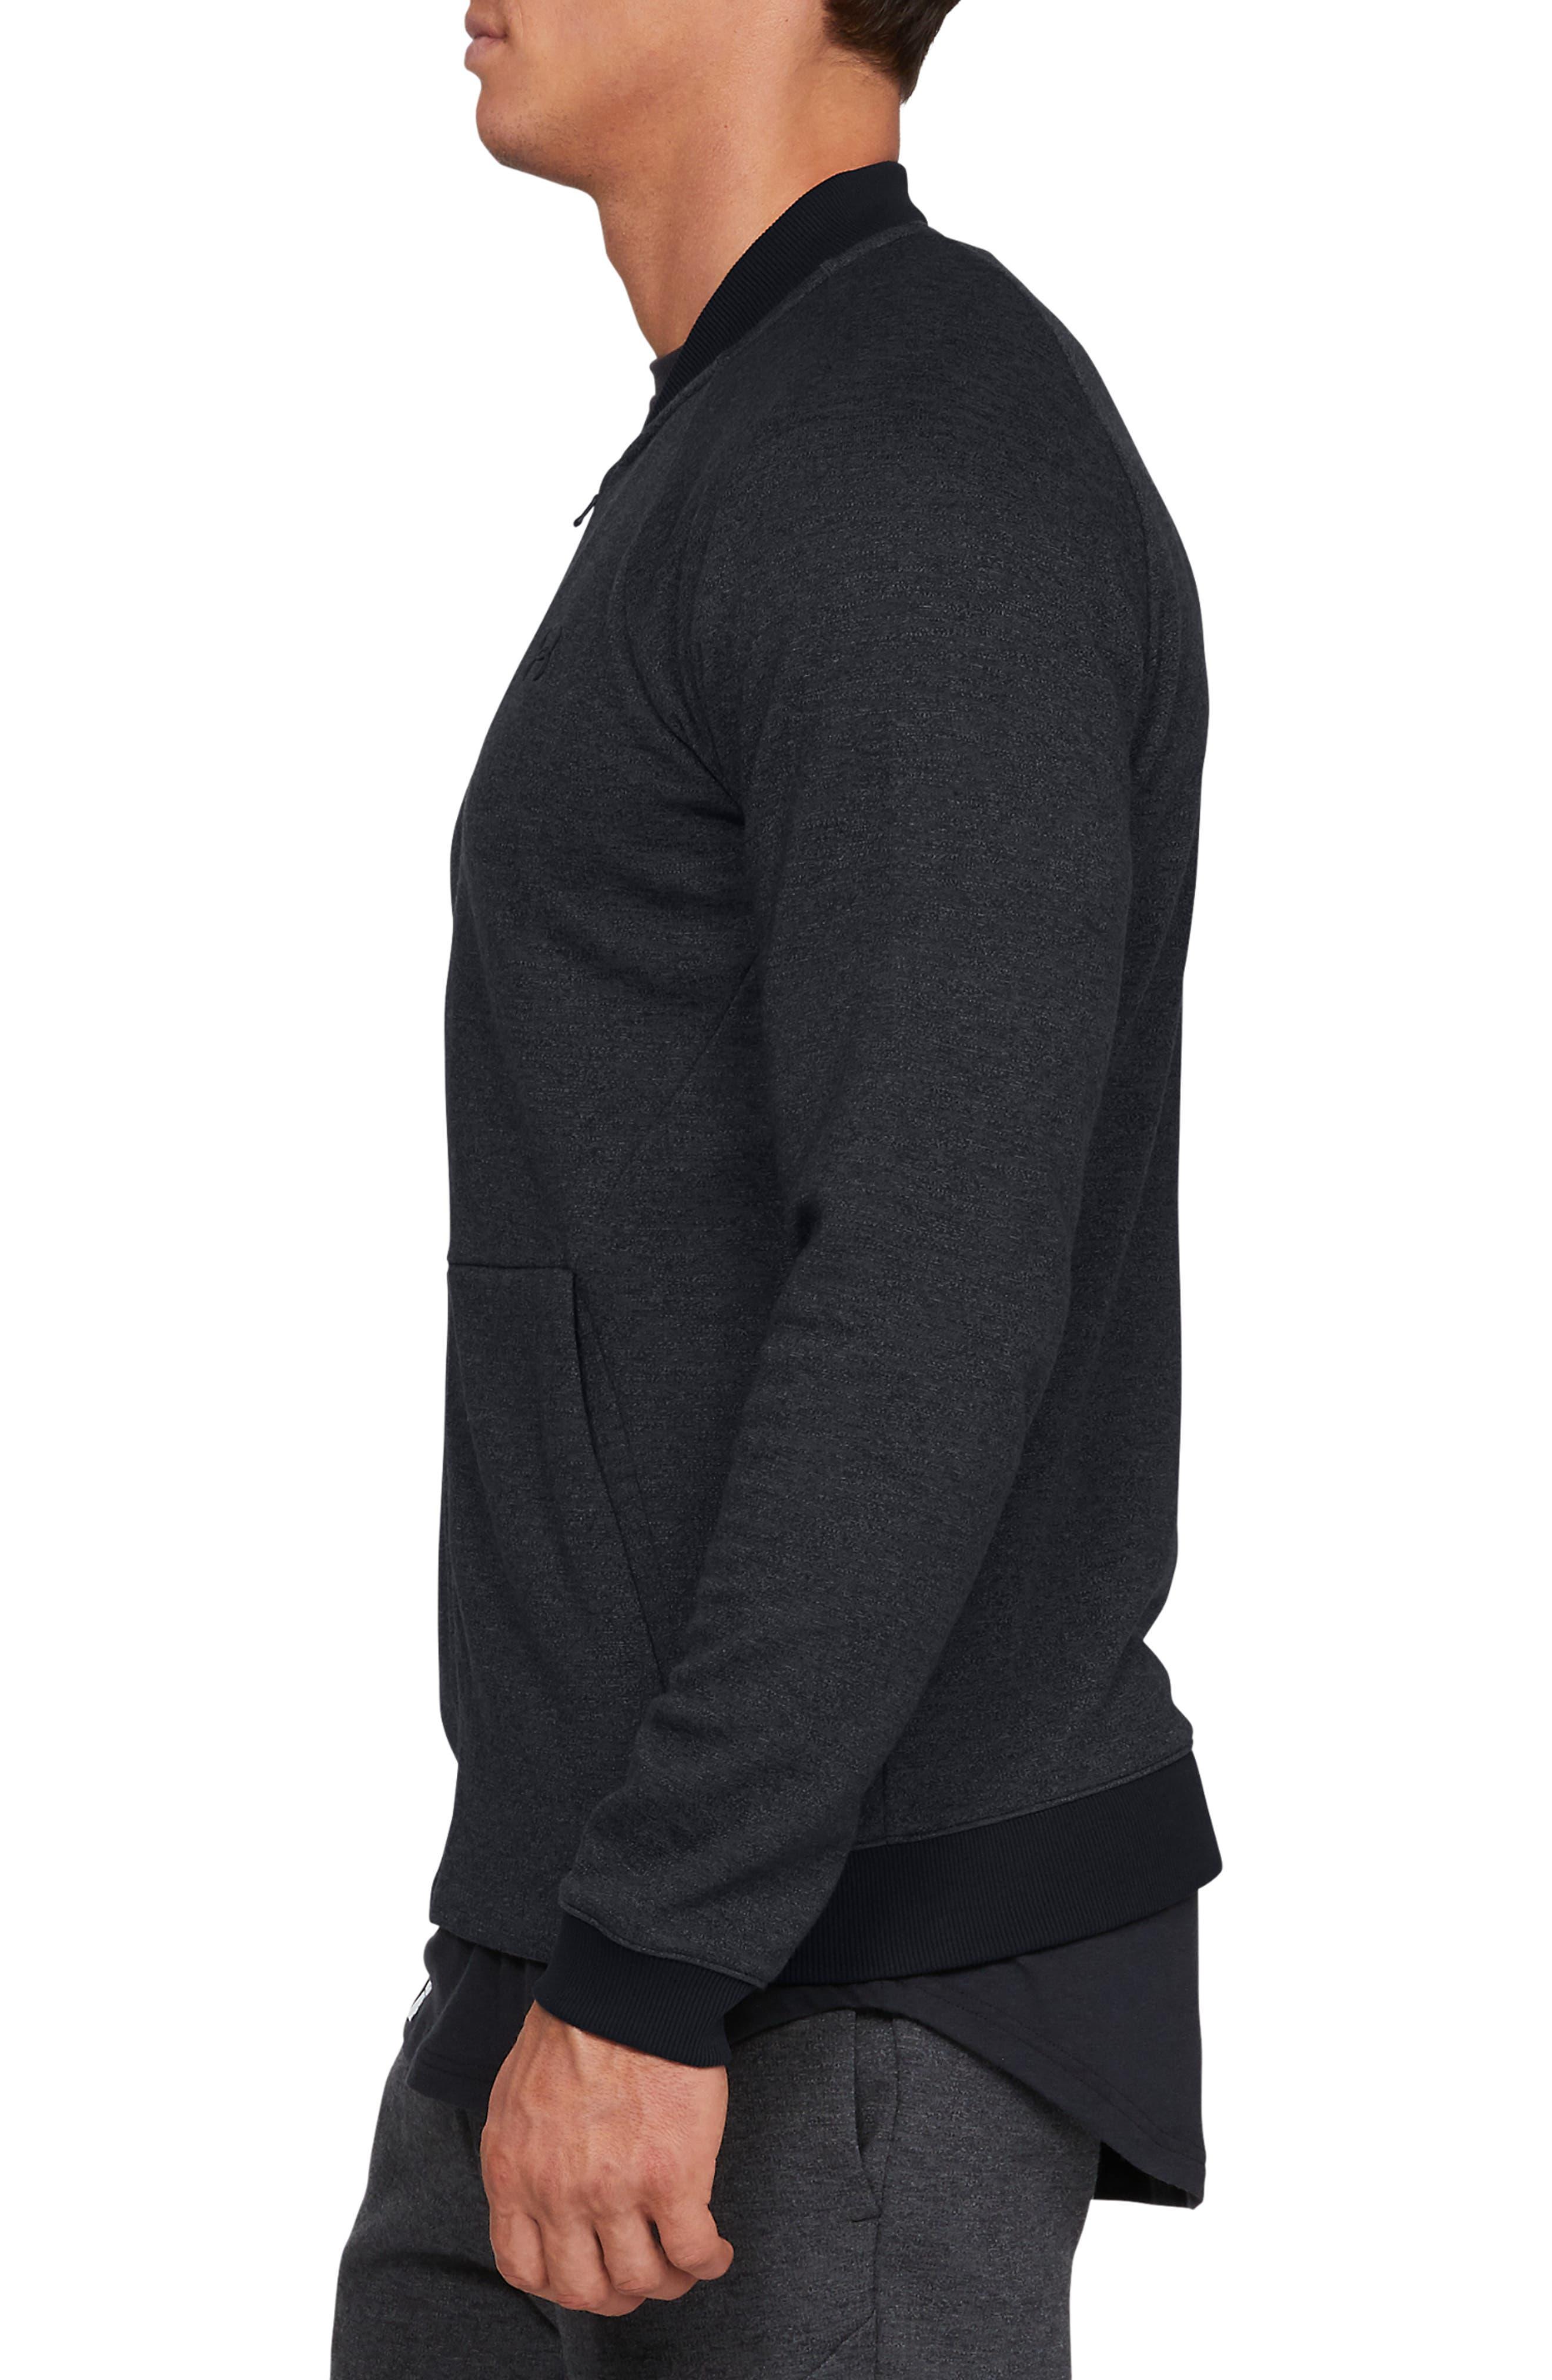 UNDER ARMOUR, Unstoppable Double Knit Bomber Jacket, Alternate thumbnail 4, color, BLACK/ BLACK/ BLACK